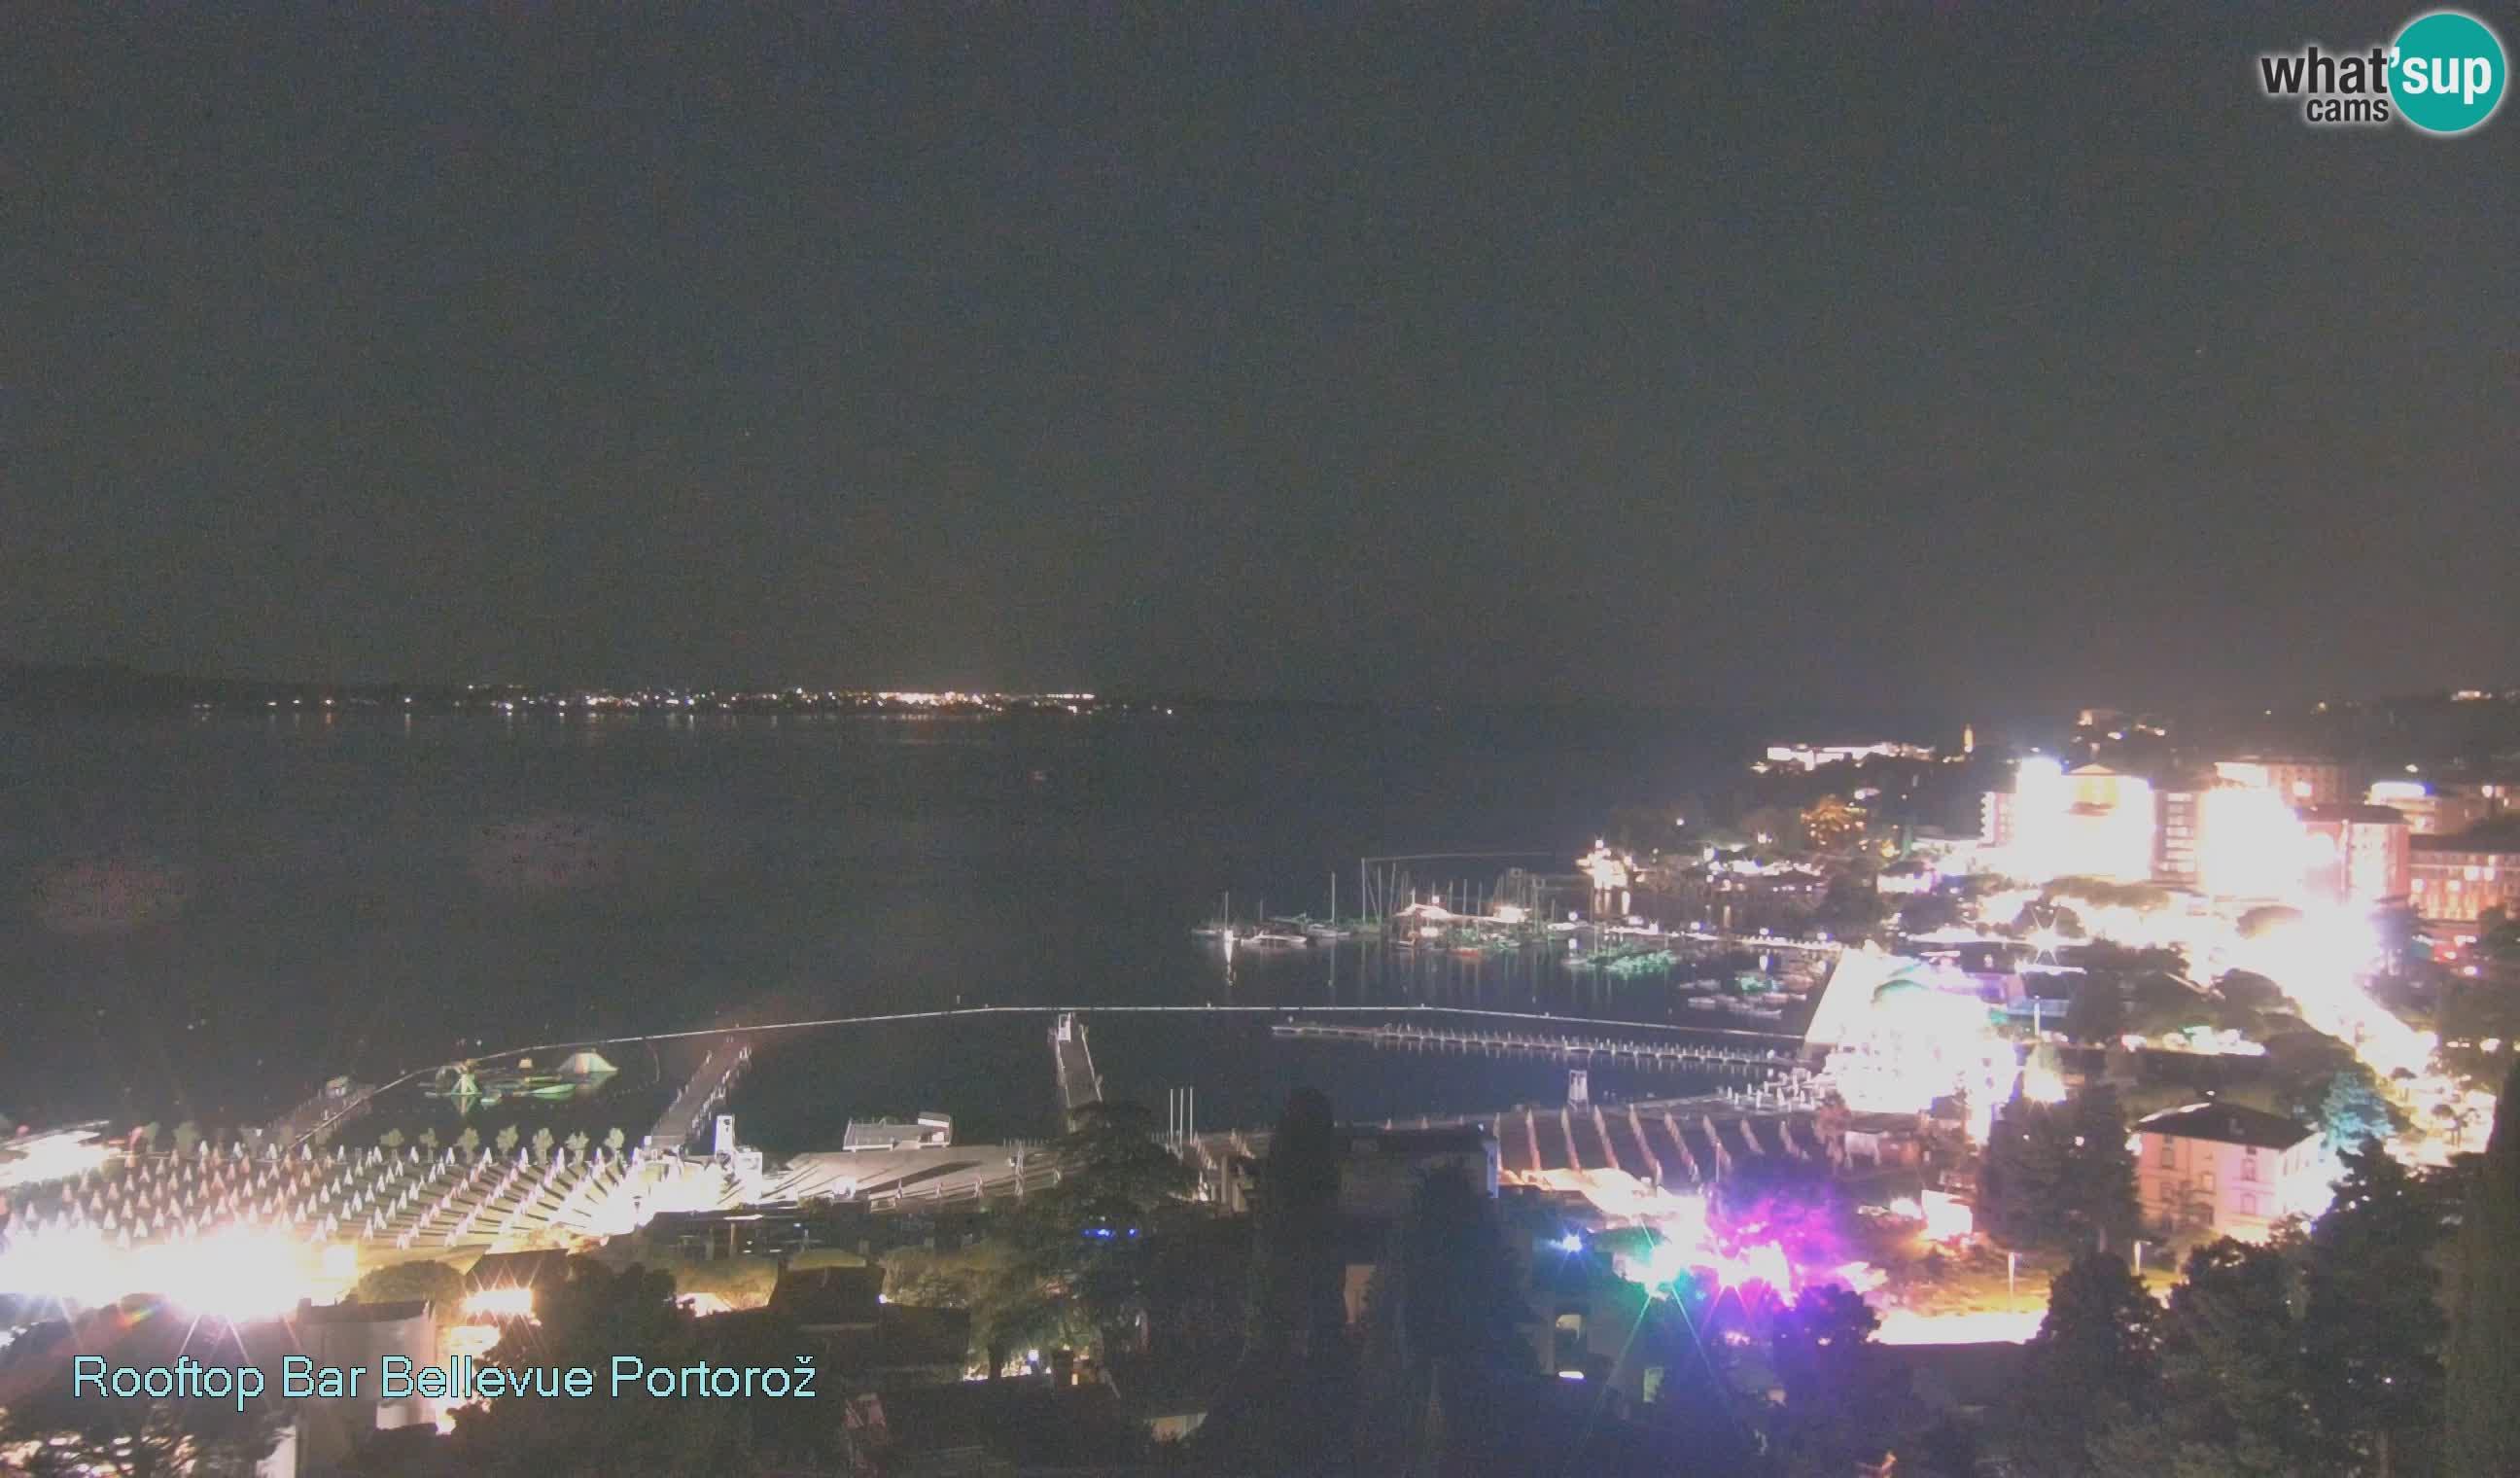 Portorož Sun. 22:35